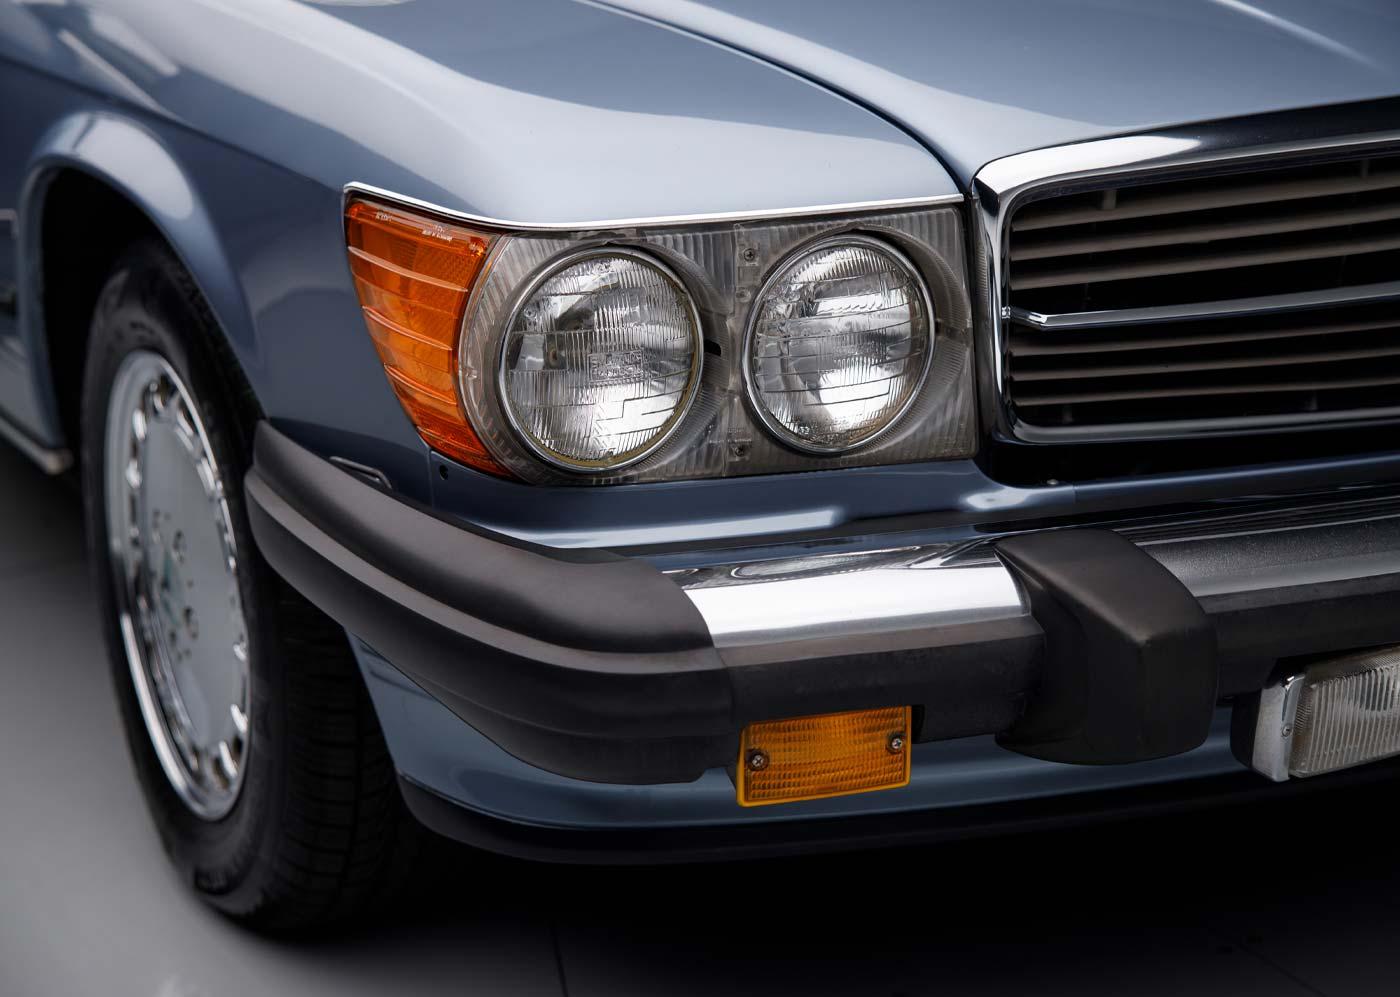 1986 Mercedes 560 SL - The JBS Collection Blog